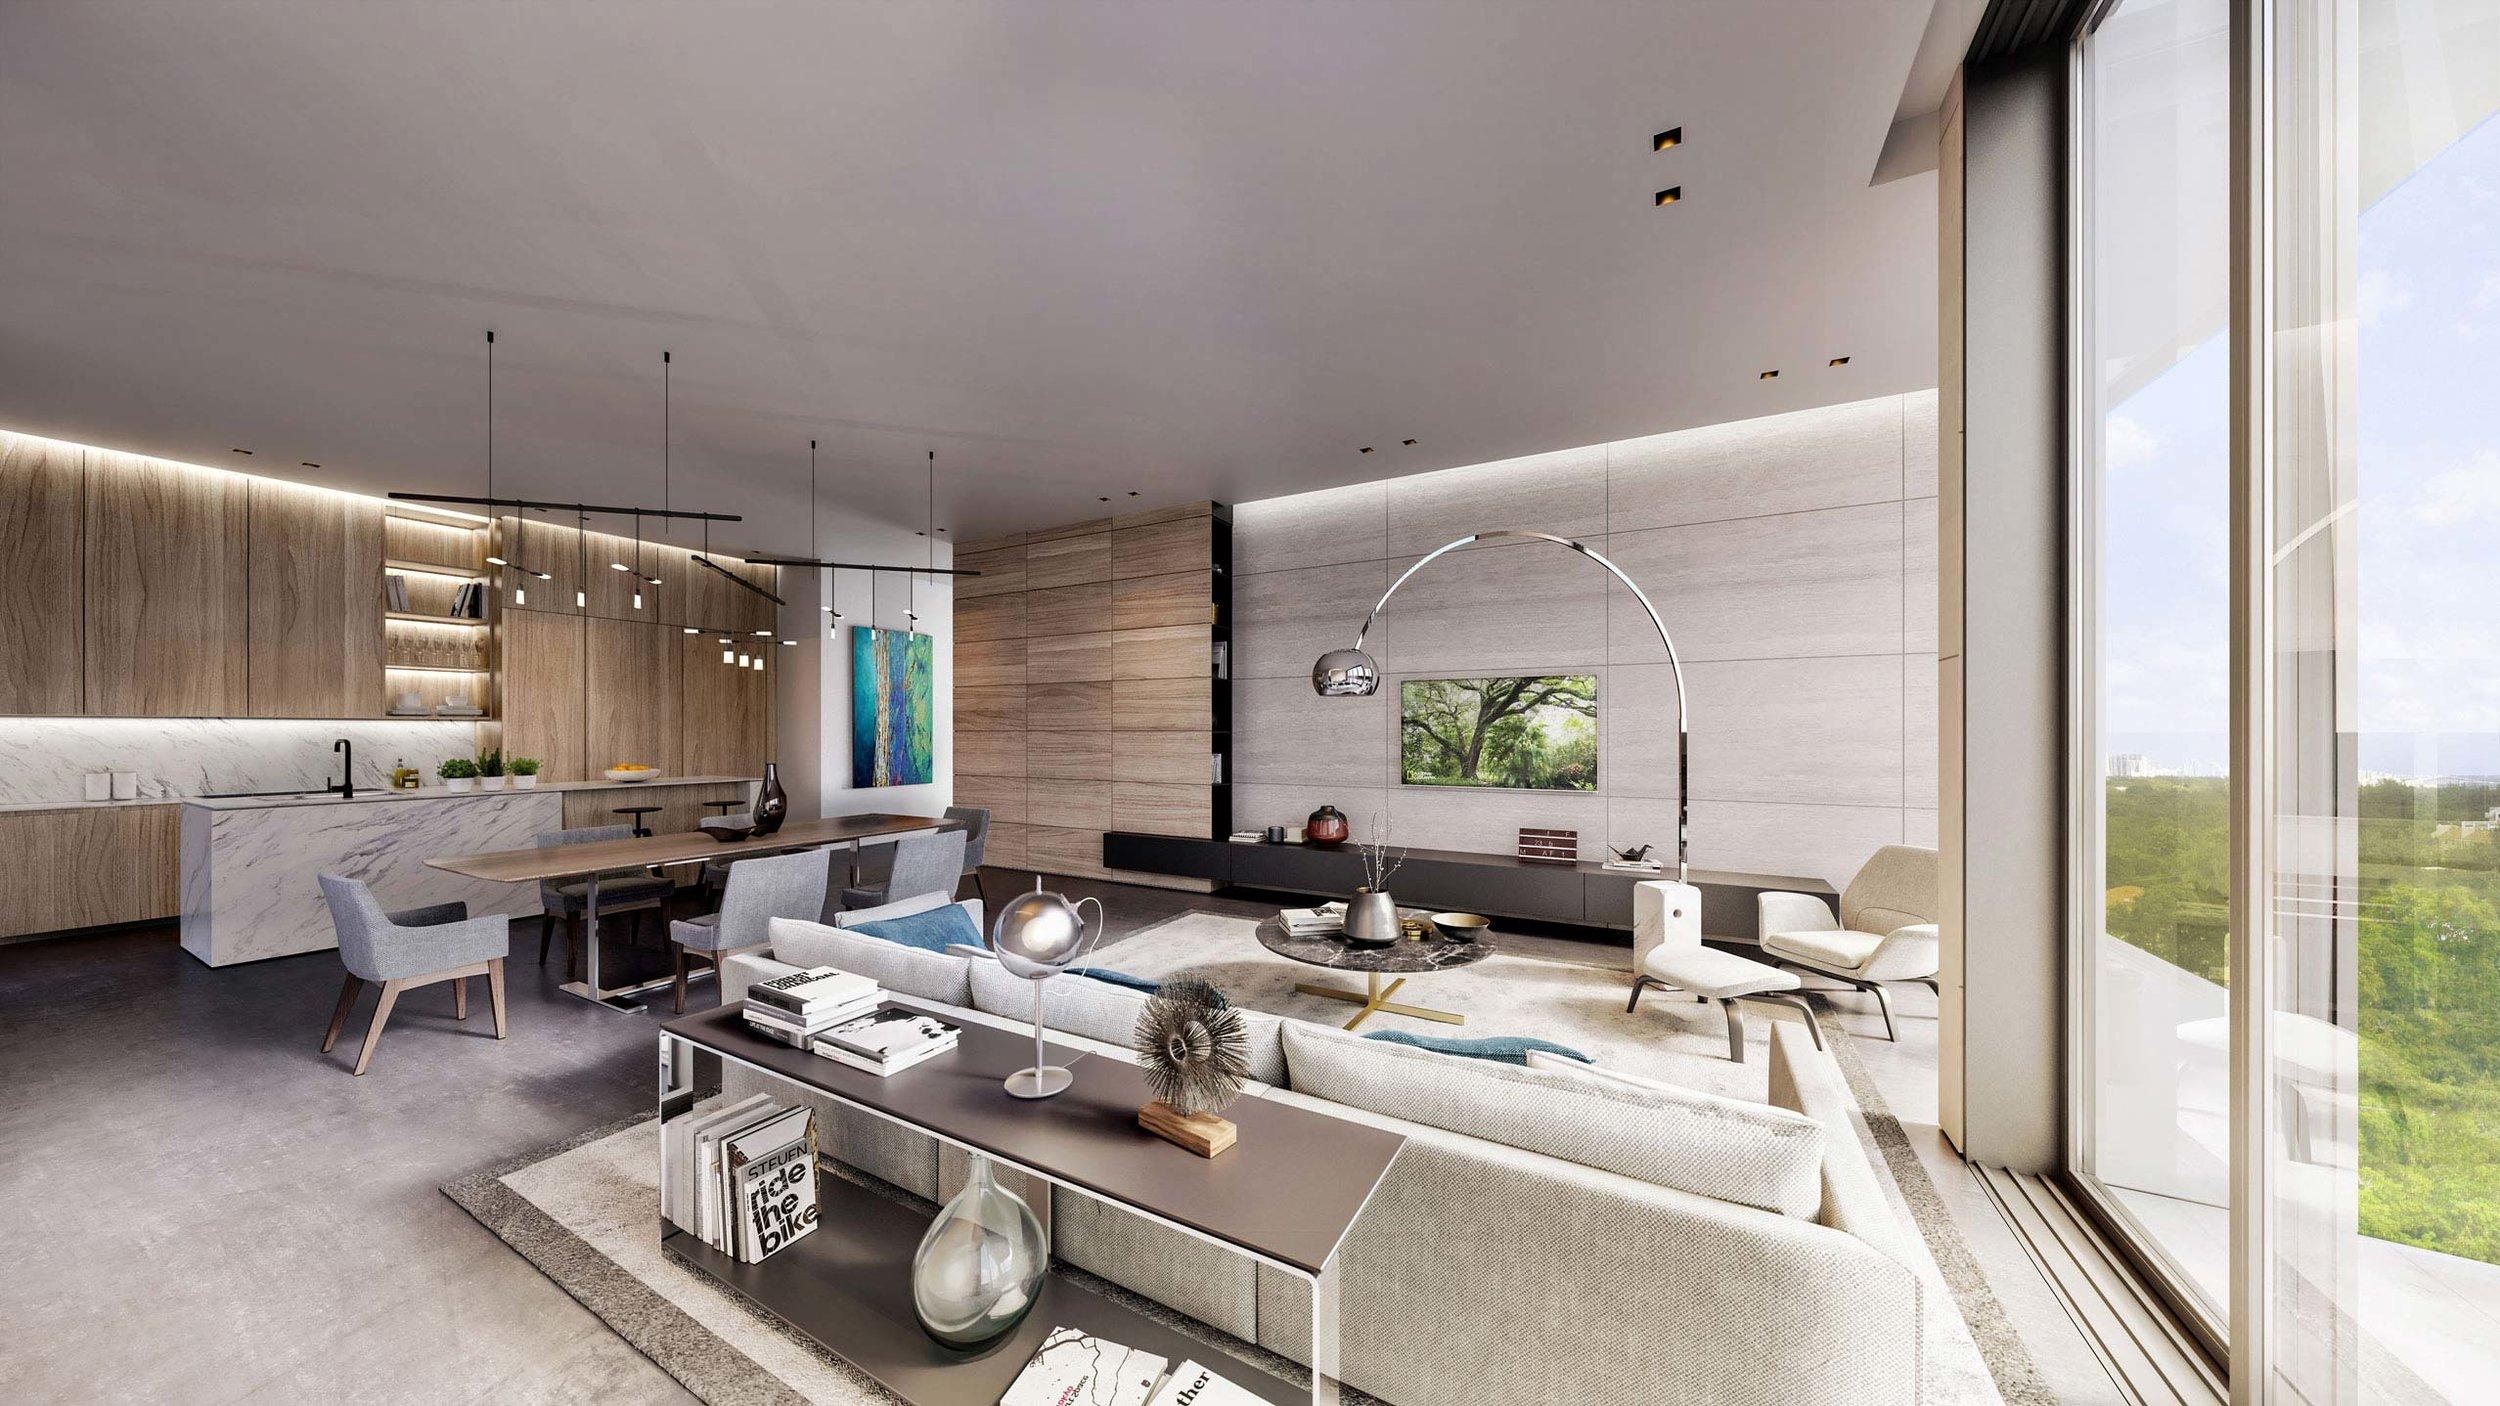 glasshaus-living-area-view.jpg